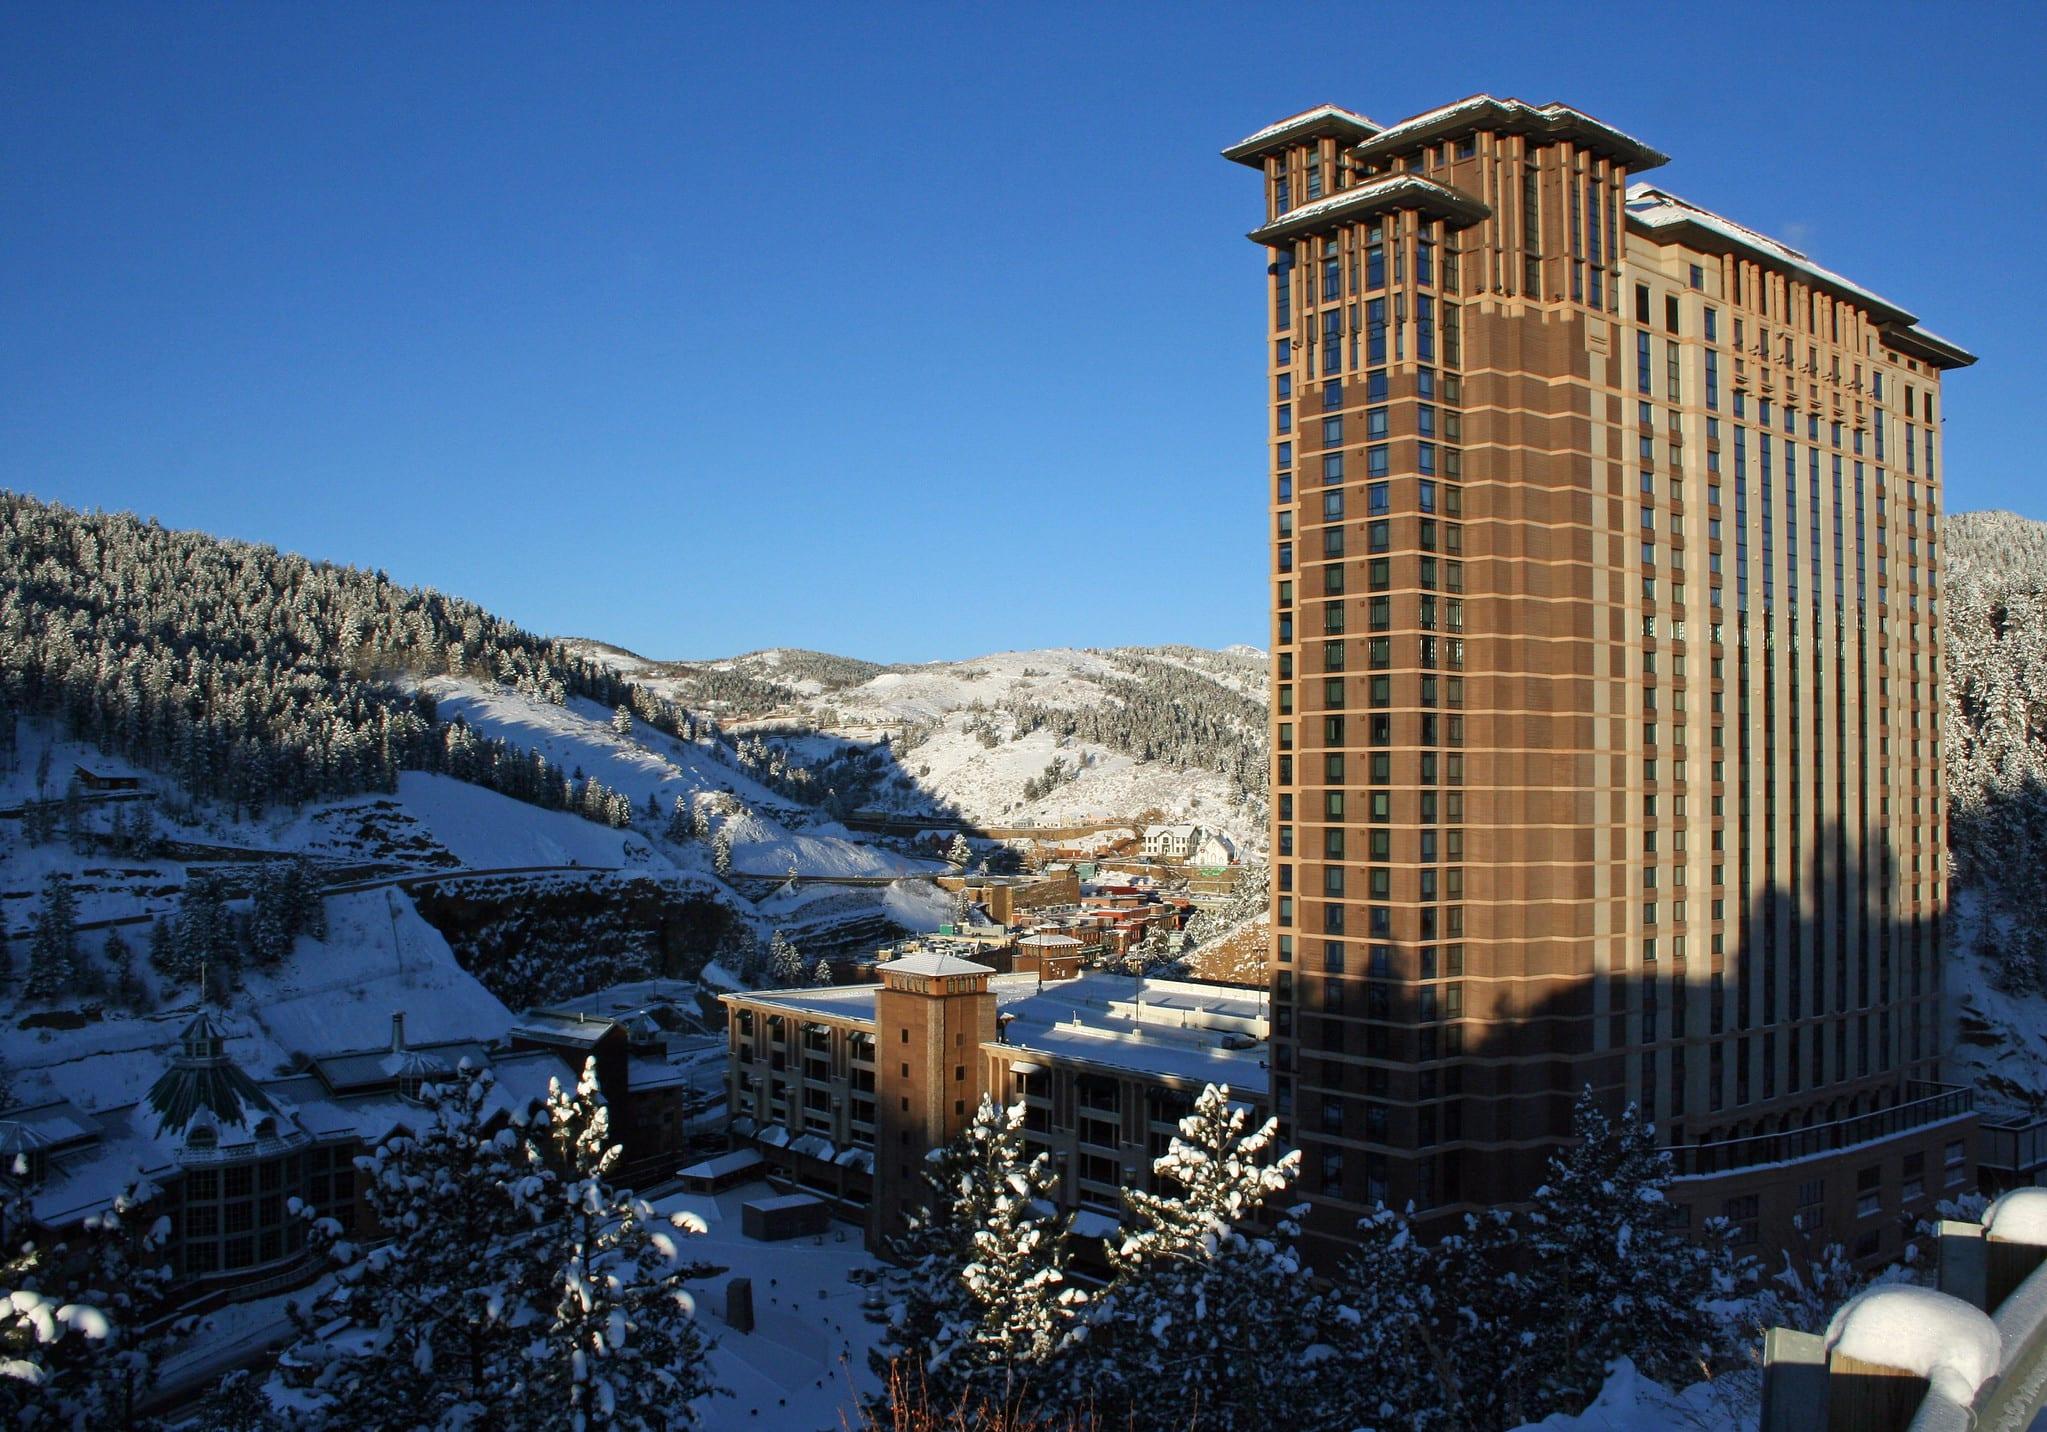 image of ameristar casino in Black hawk